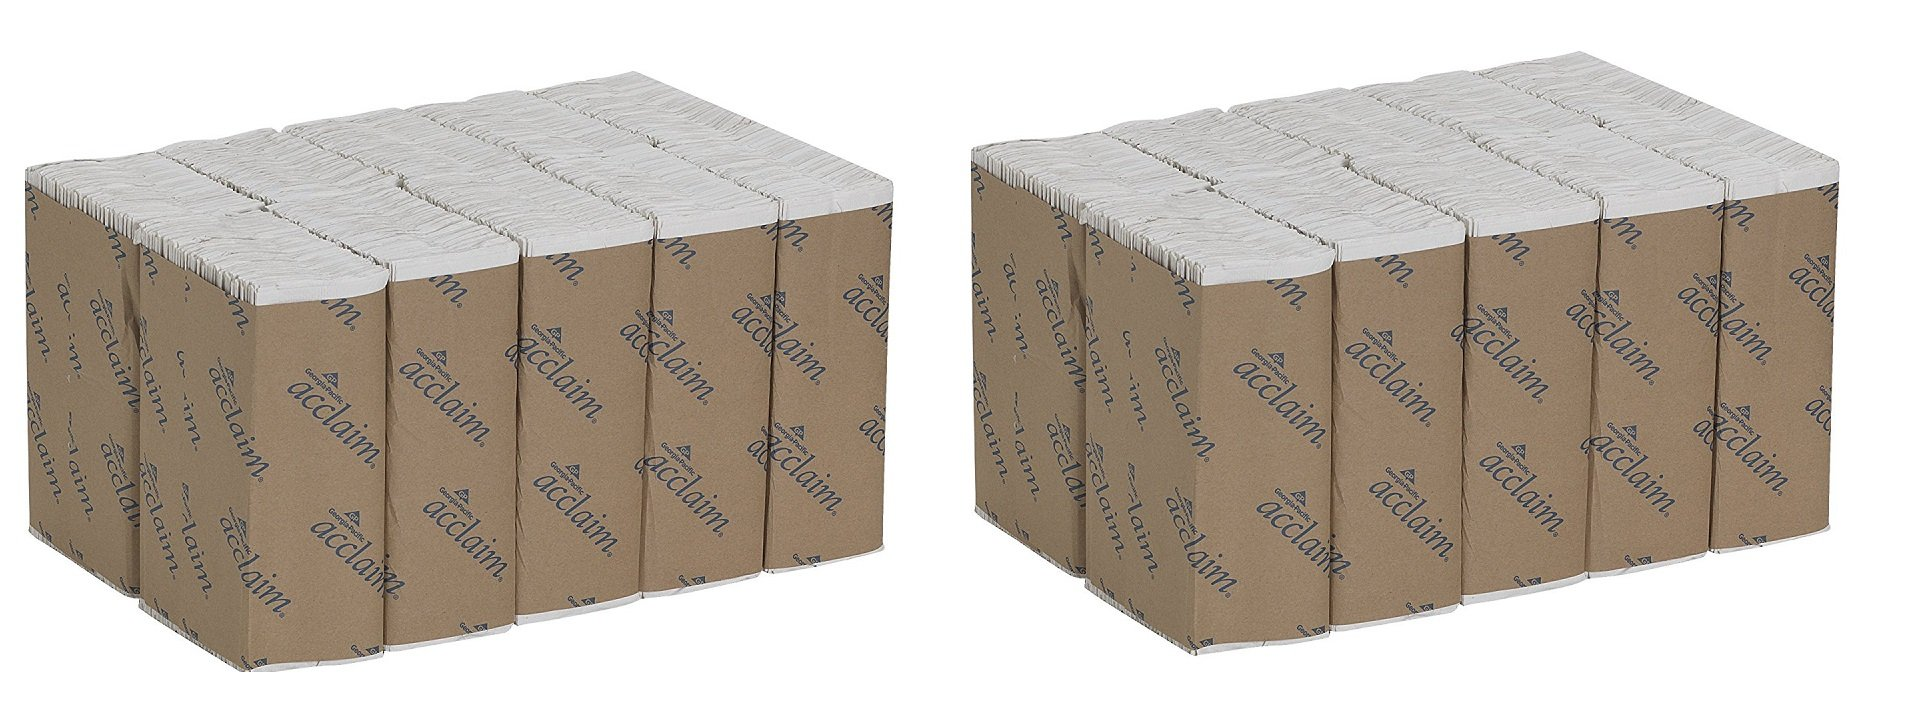 Georgia Pacific Professional 20603 C-Fold Paper Towels, 10 1/10 x 13 1/5, White xurqzP, 240 Per Pack (Case of 20 Packs)